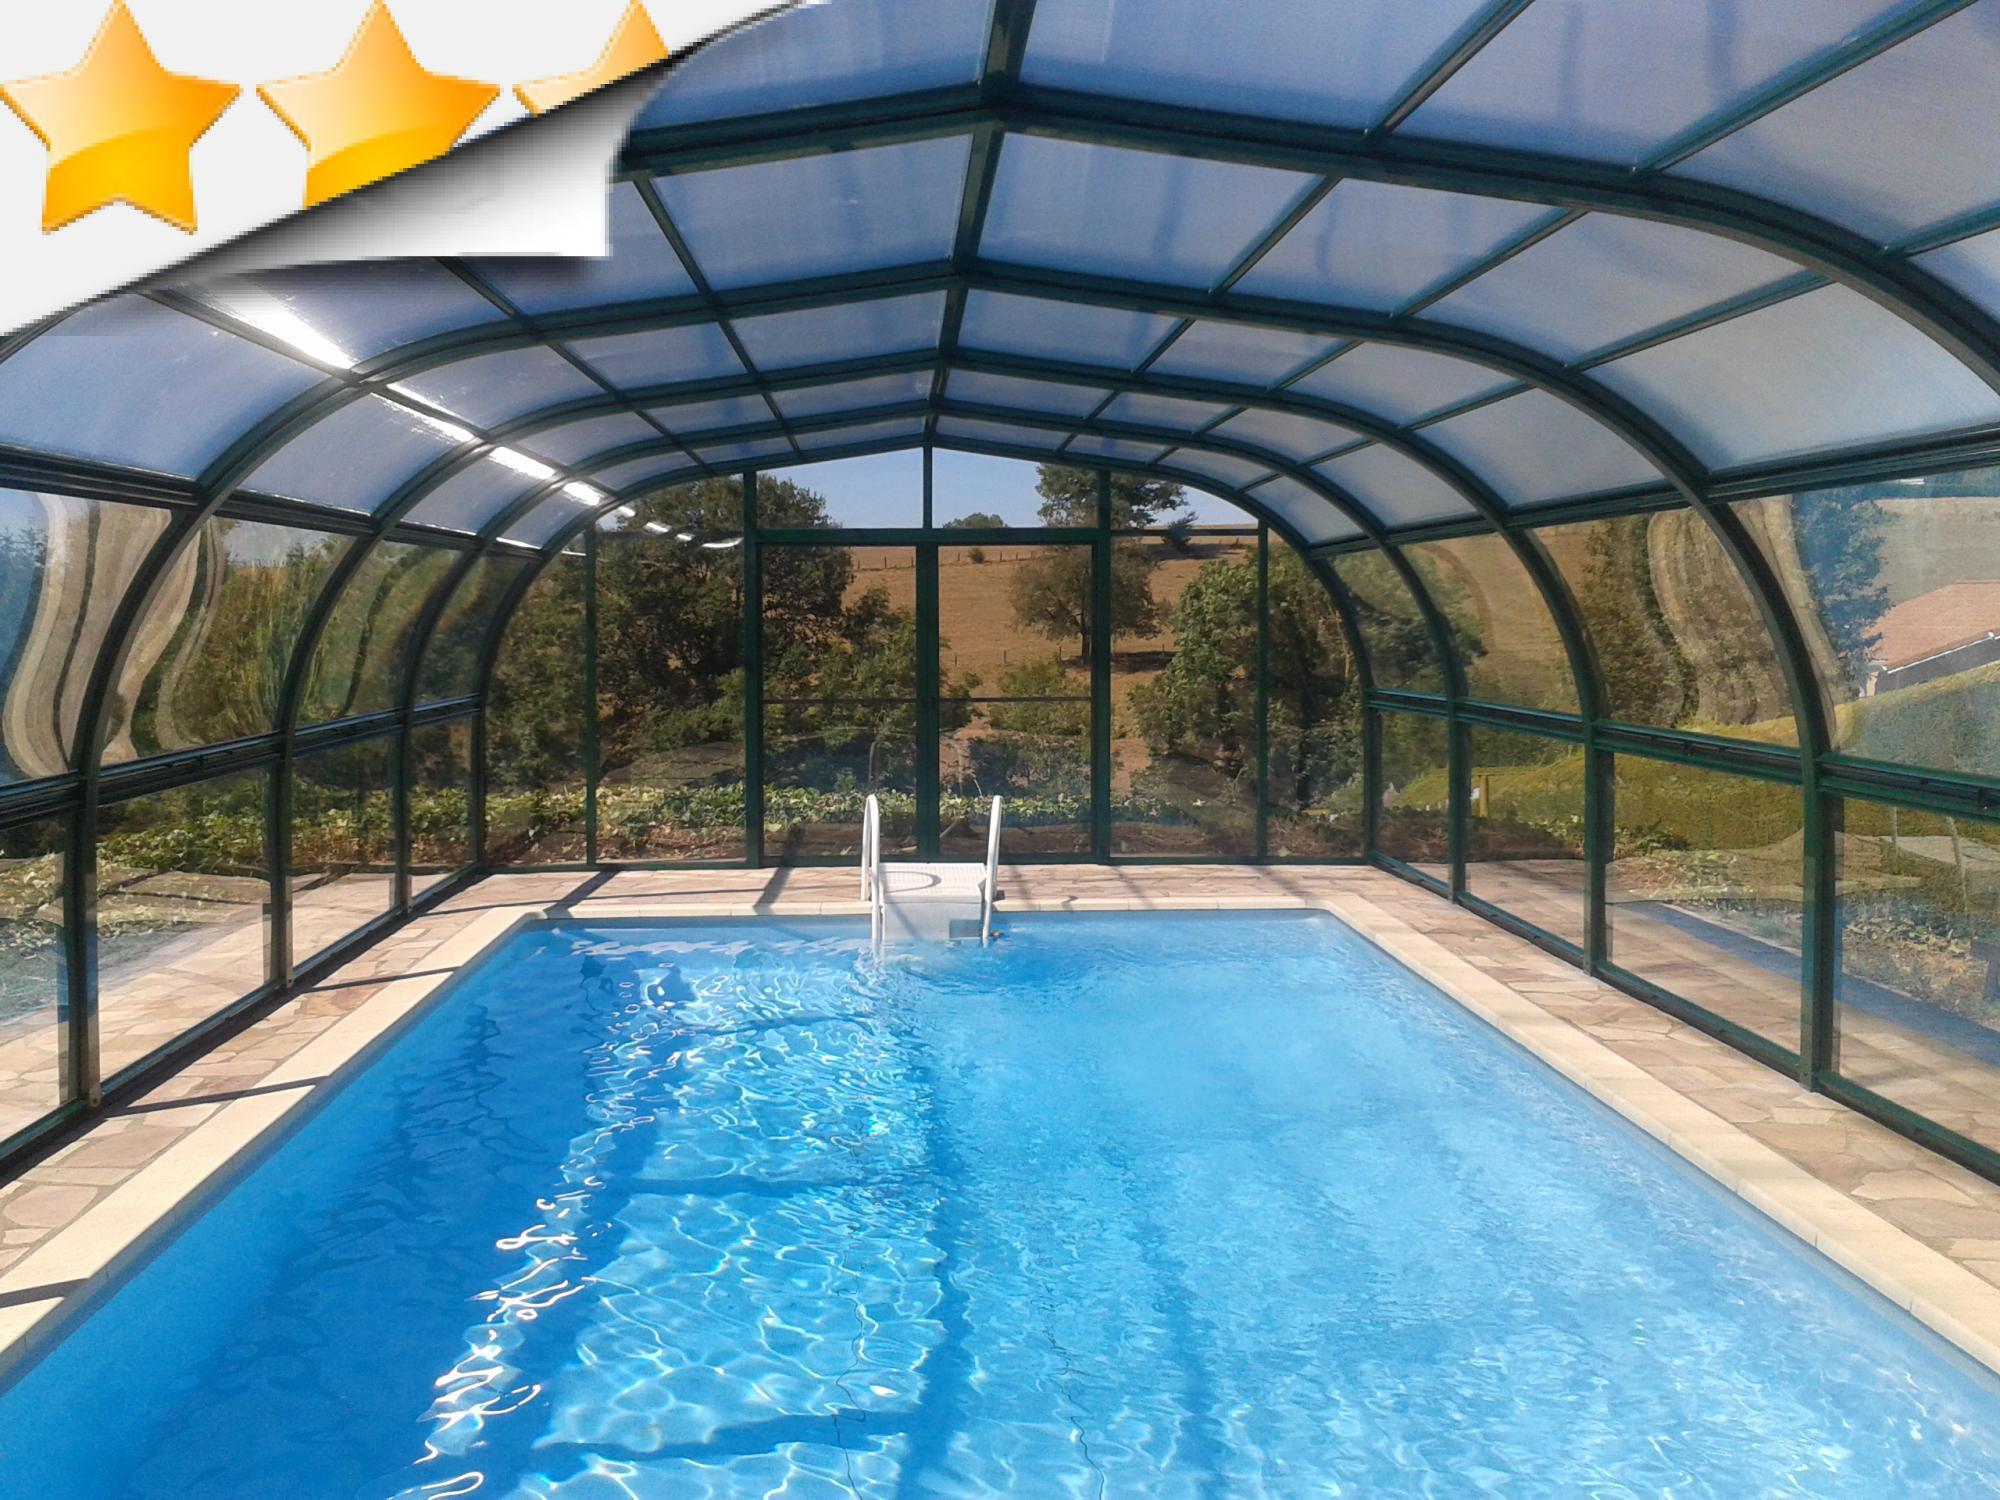 Vente abri de piscine par lpc for Vente de piscine